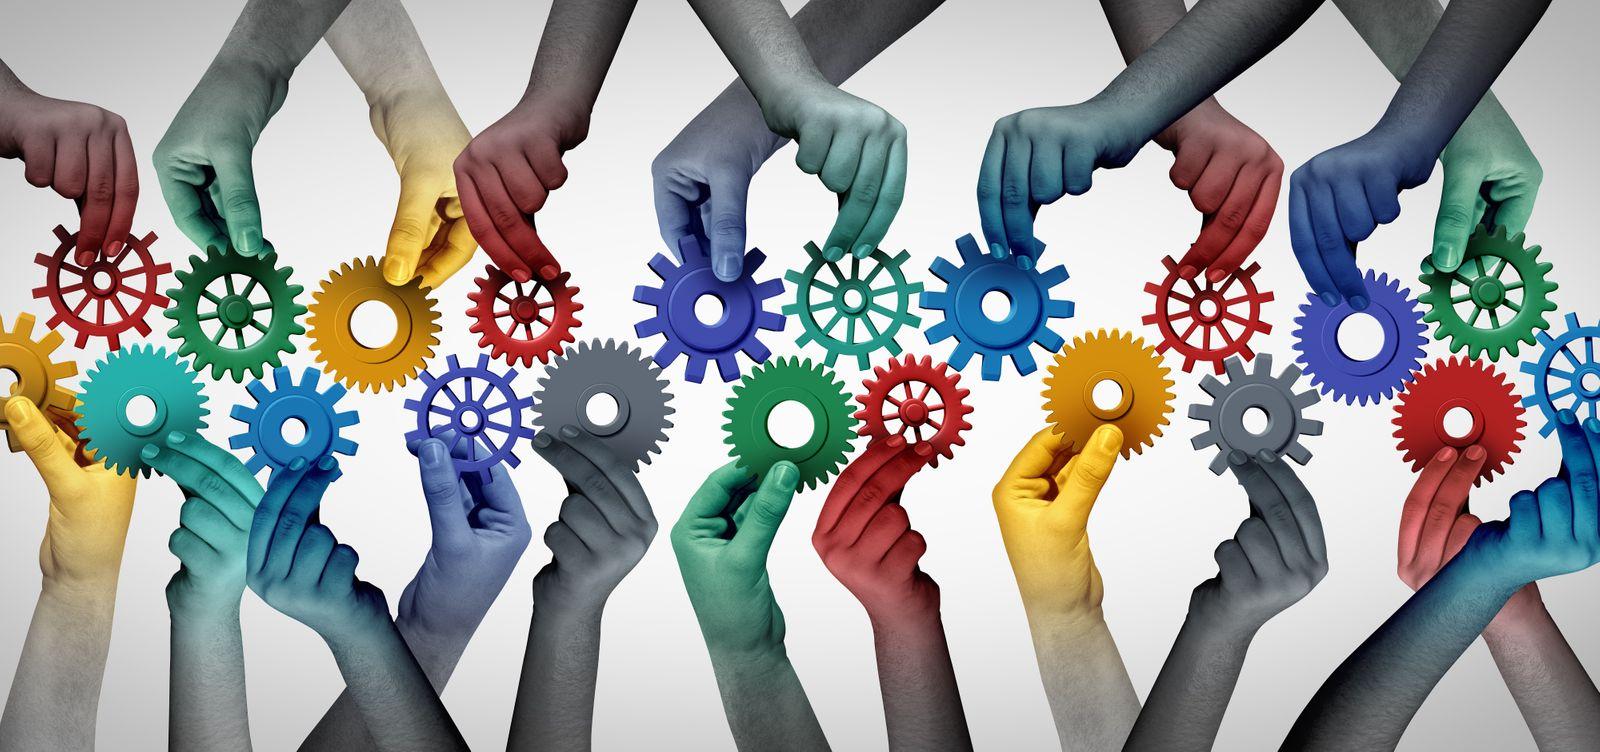 Team Collaboration Concept